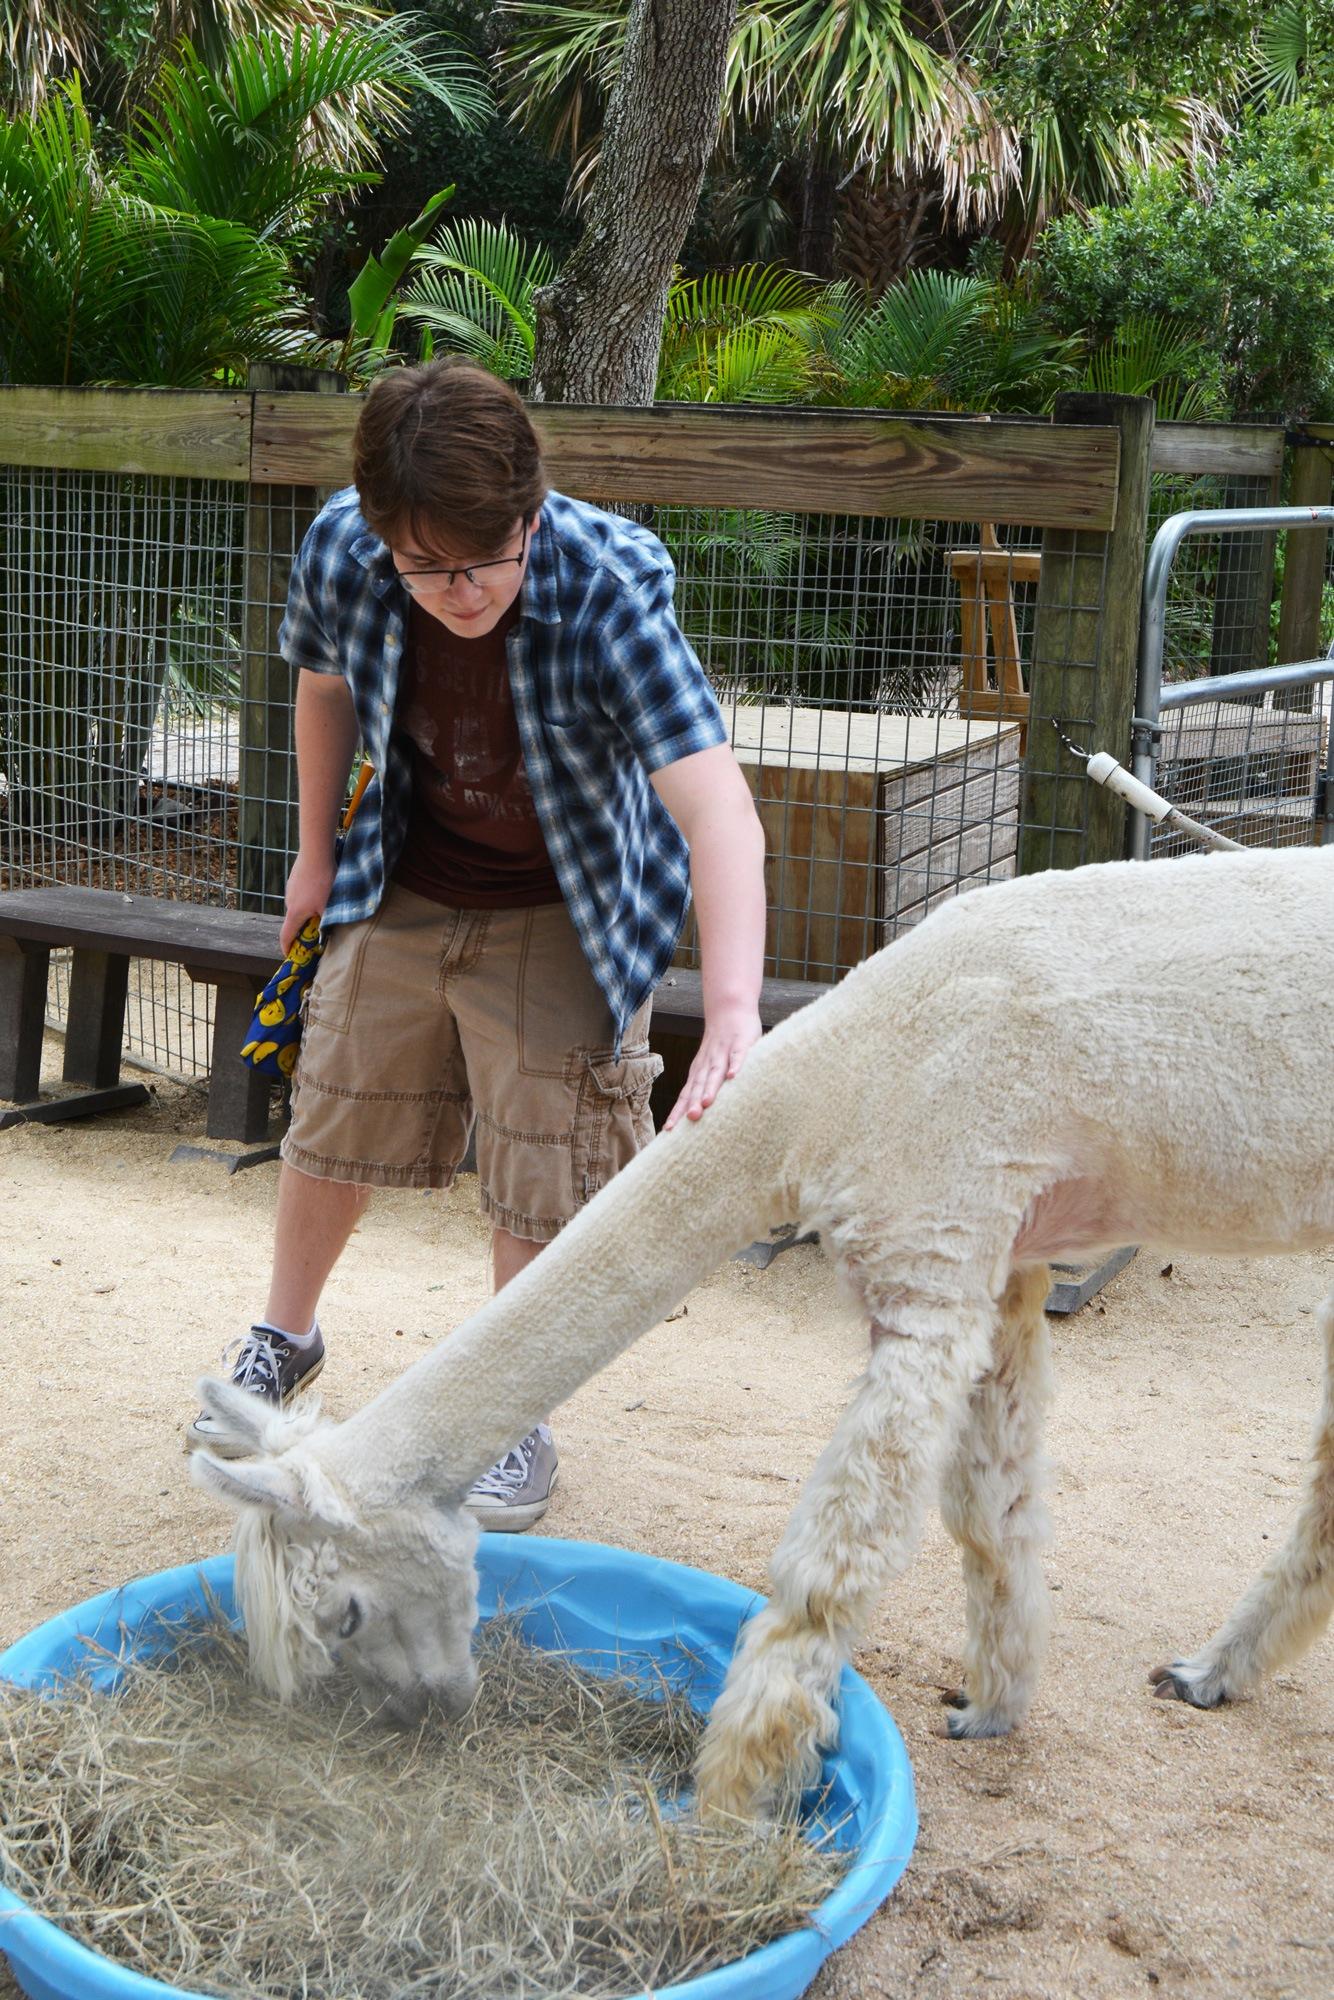 Petting an Alpaca